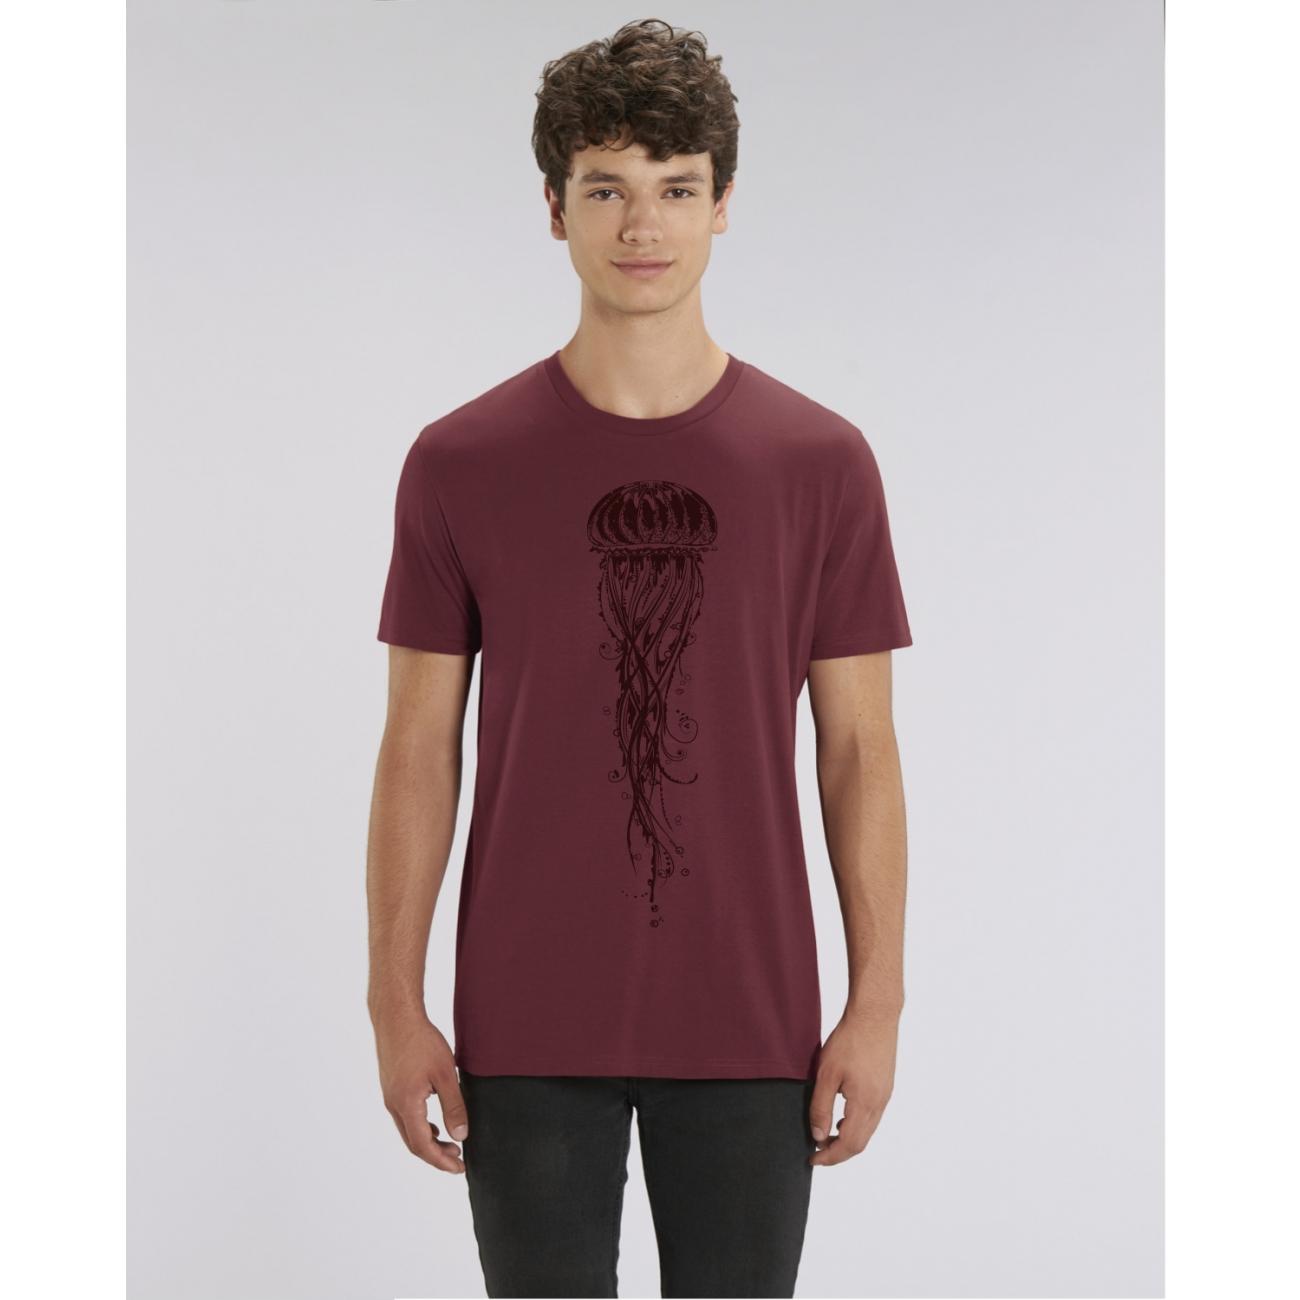 https://tee-shirt-bio.com/7835-thickbox_default/tee-shirt-coton-bio-col-rond-bordeaux-classique-impression-meduse-creator.jpg